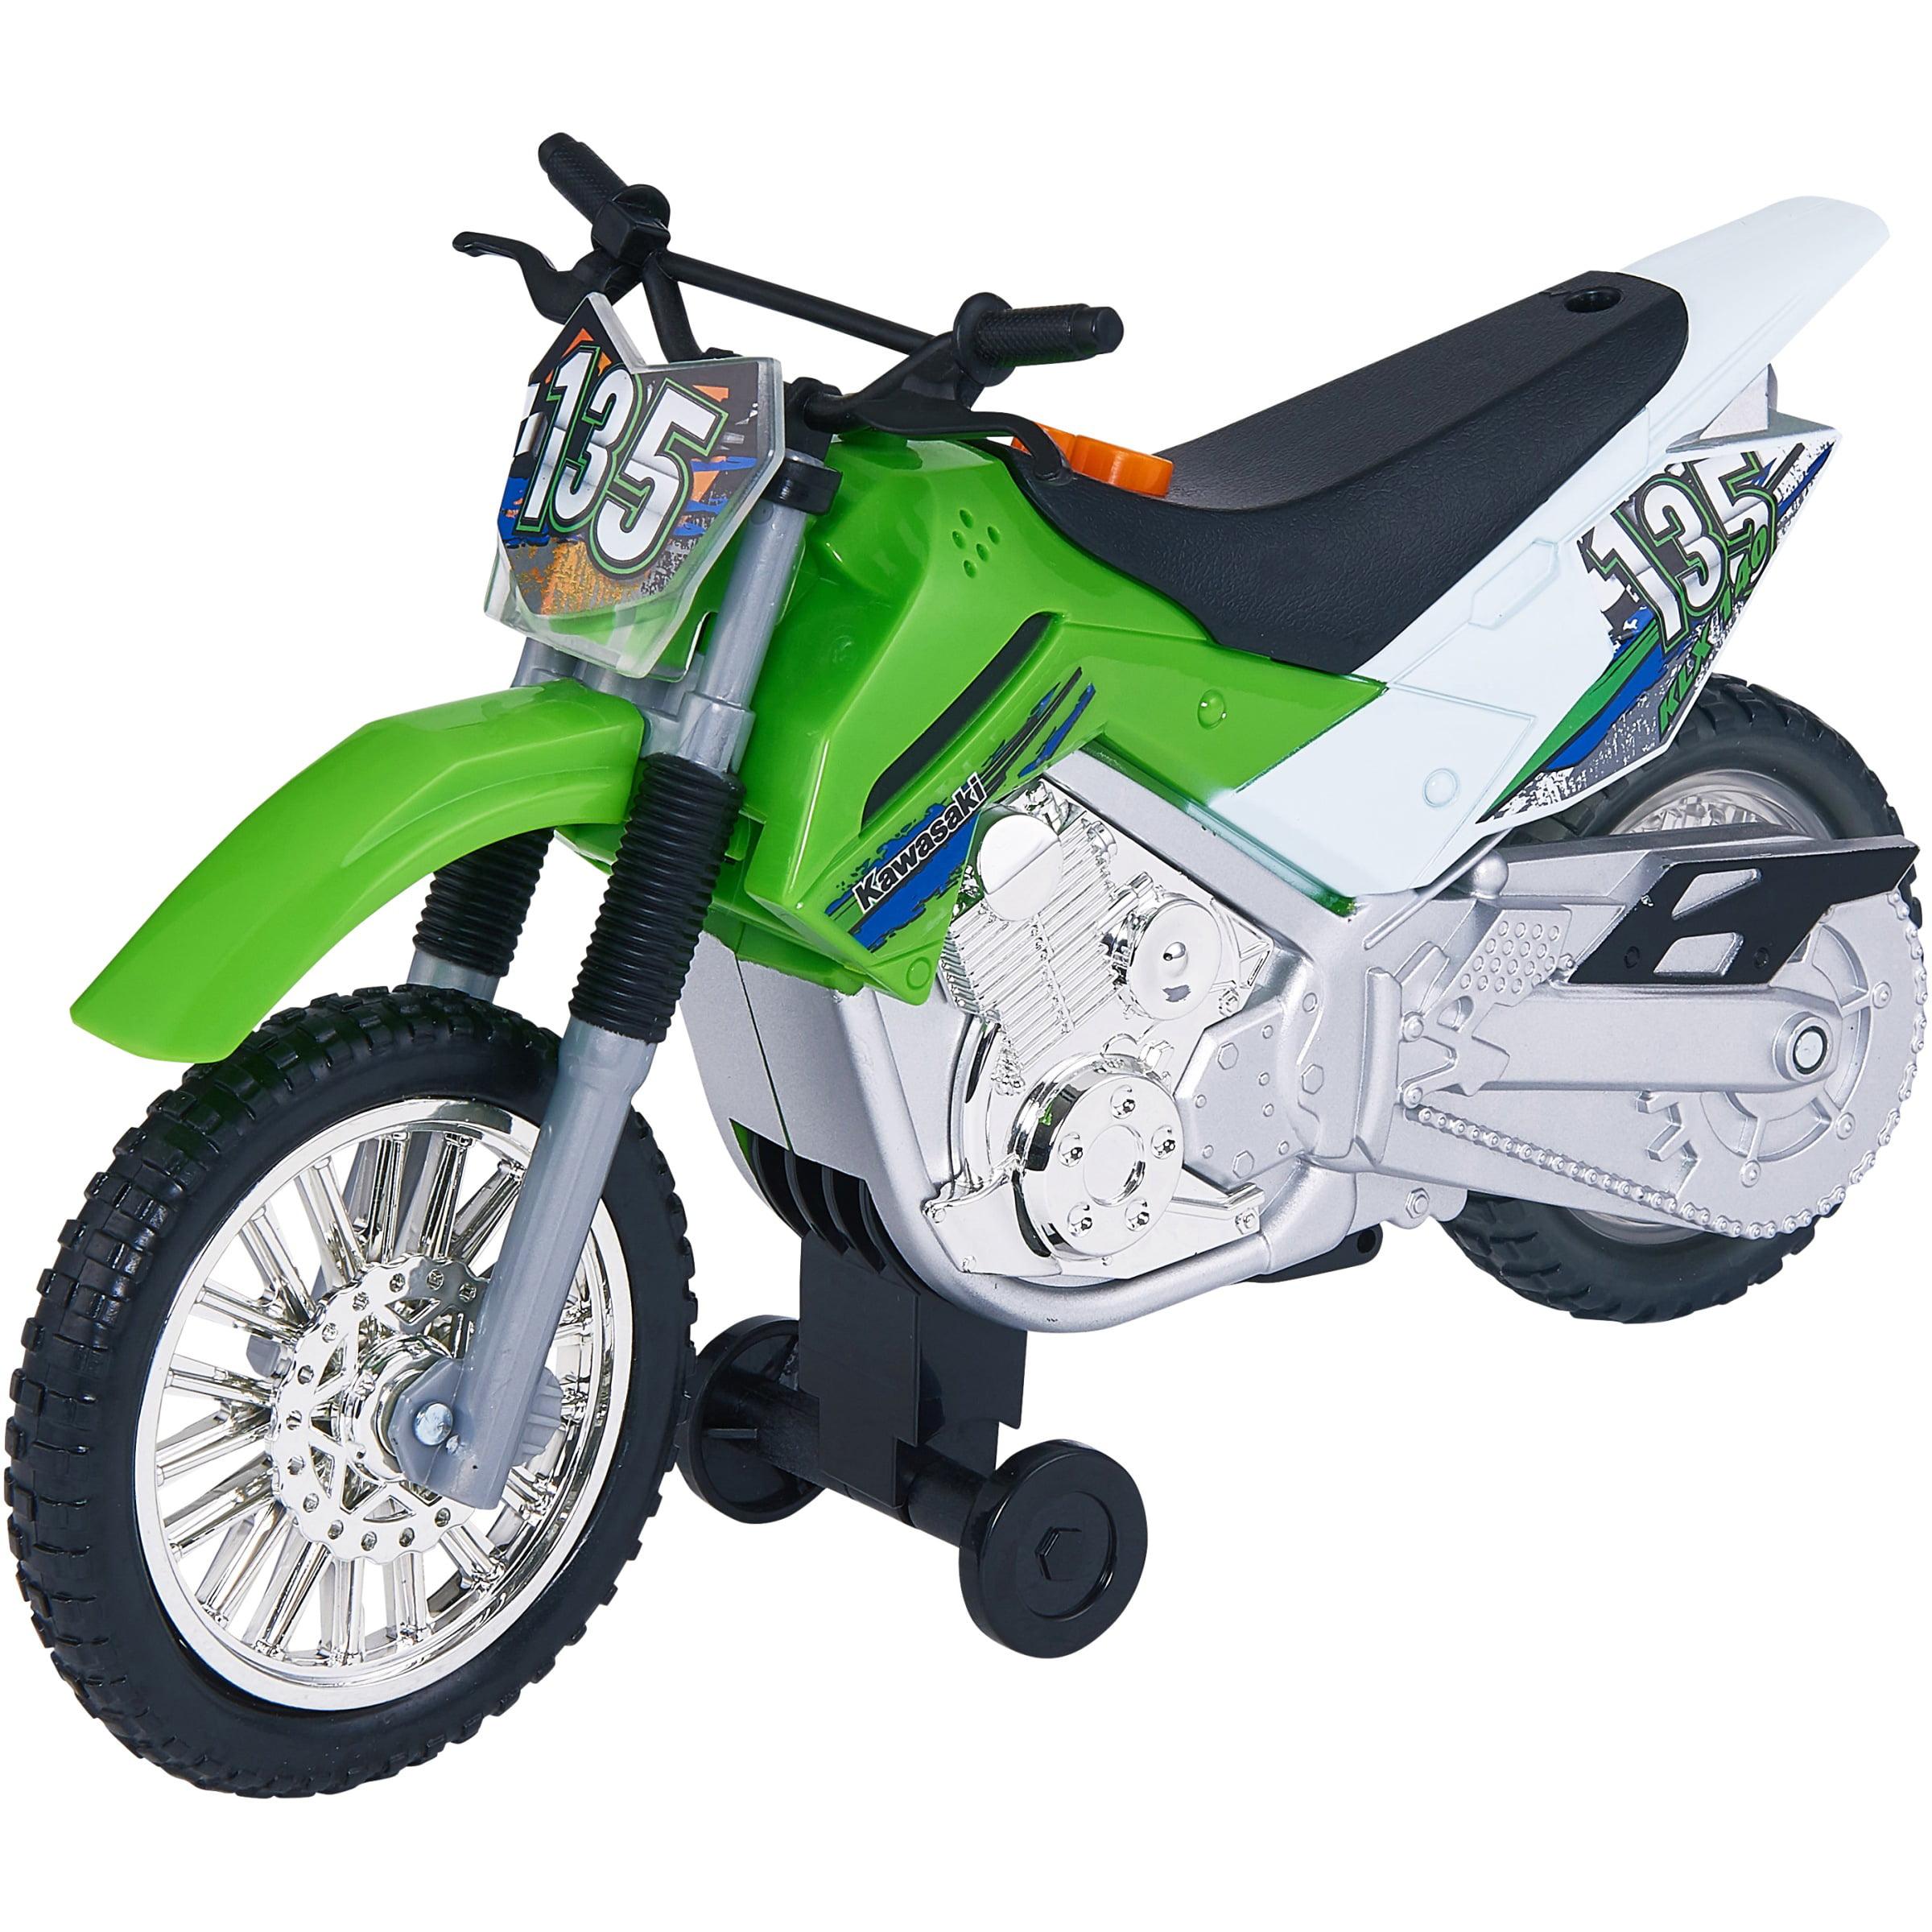 Adventure Force Light & Sound Wheel Lifters Motorized Vehicle